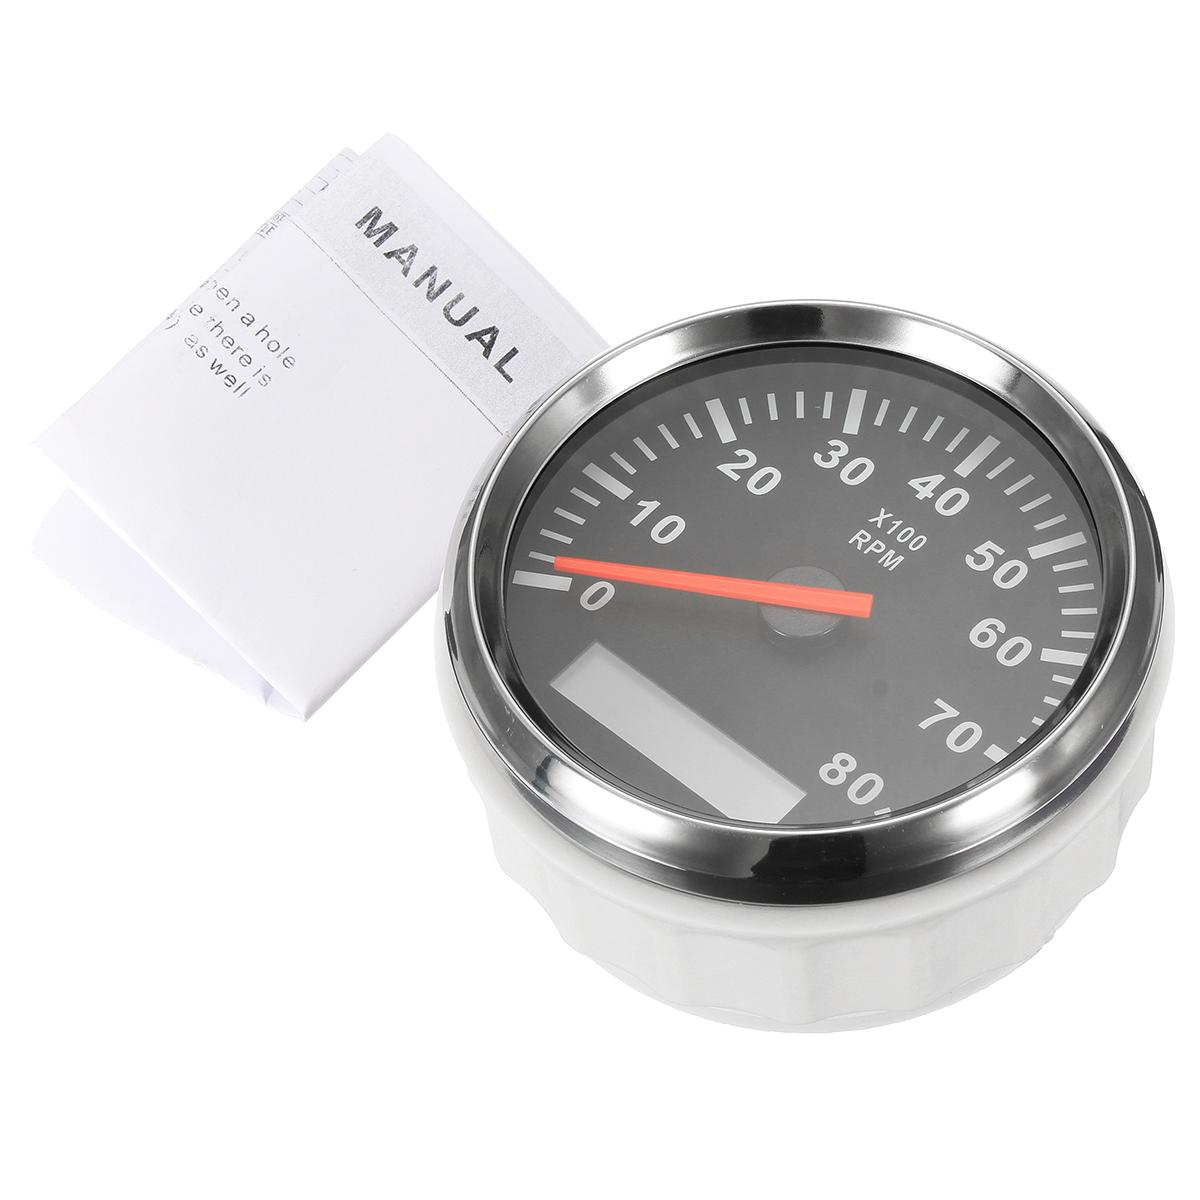 hight resolution of 12v 24v marine tachometer boat tacho meter gauge lcd hourmeter 8000 rpm 85mm